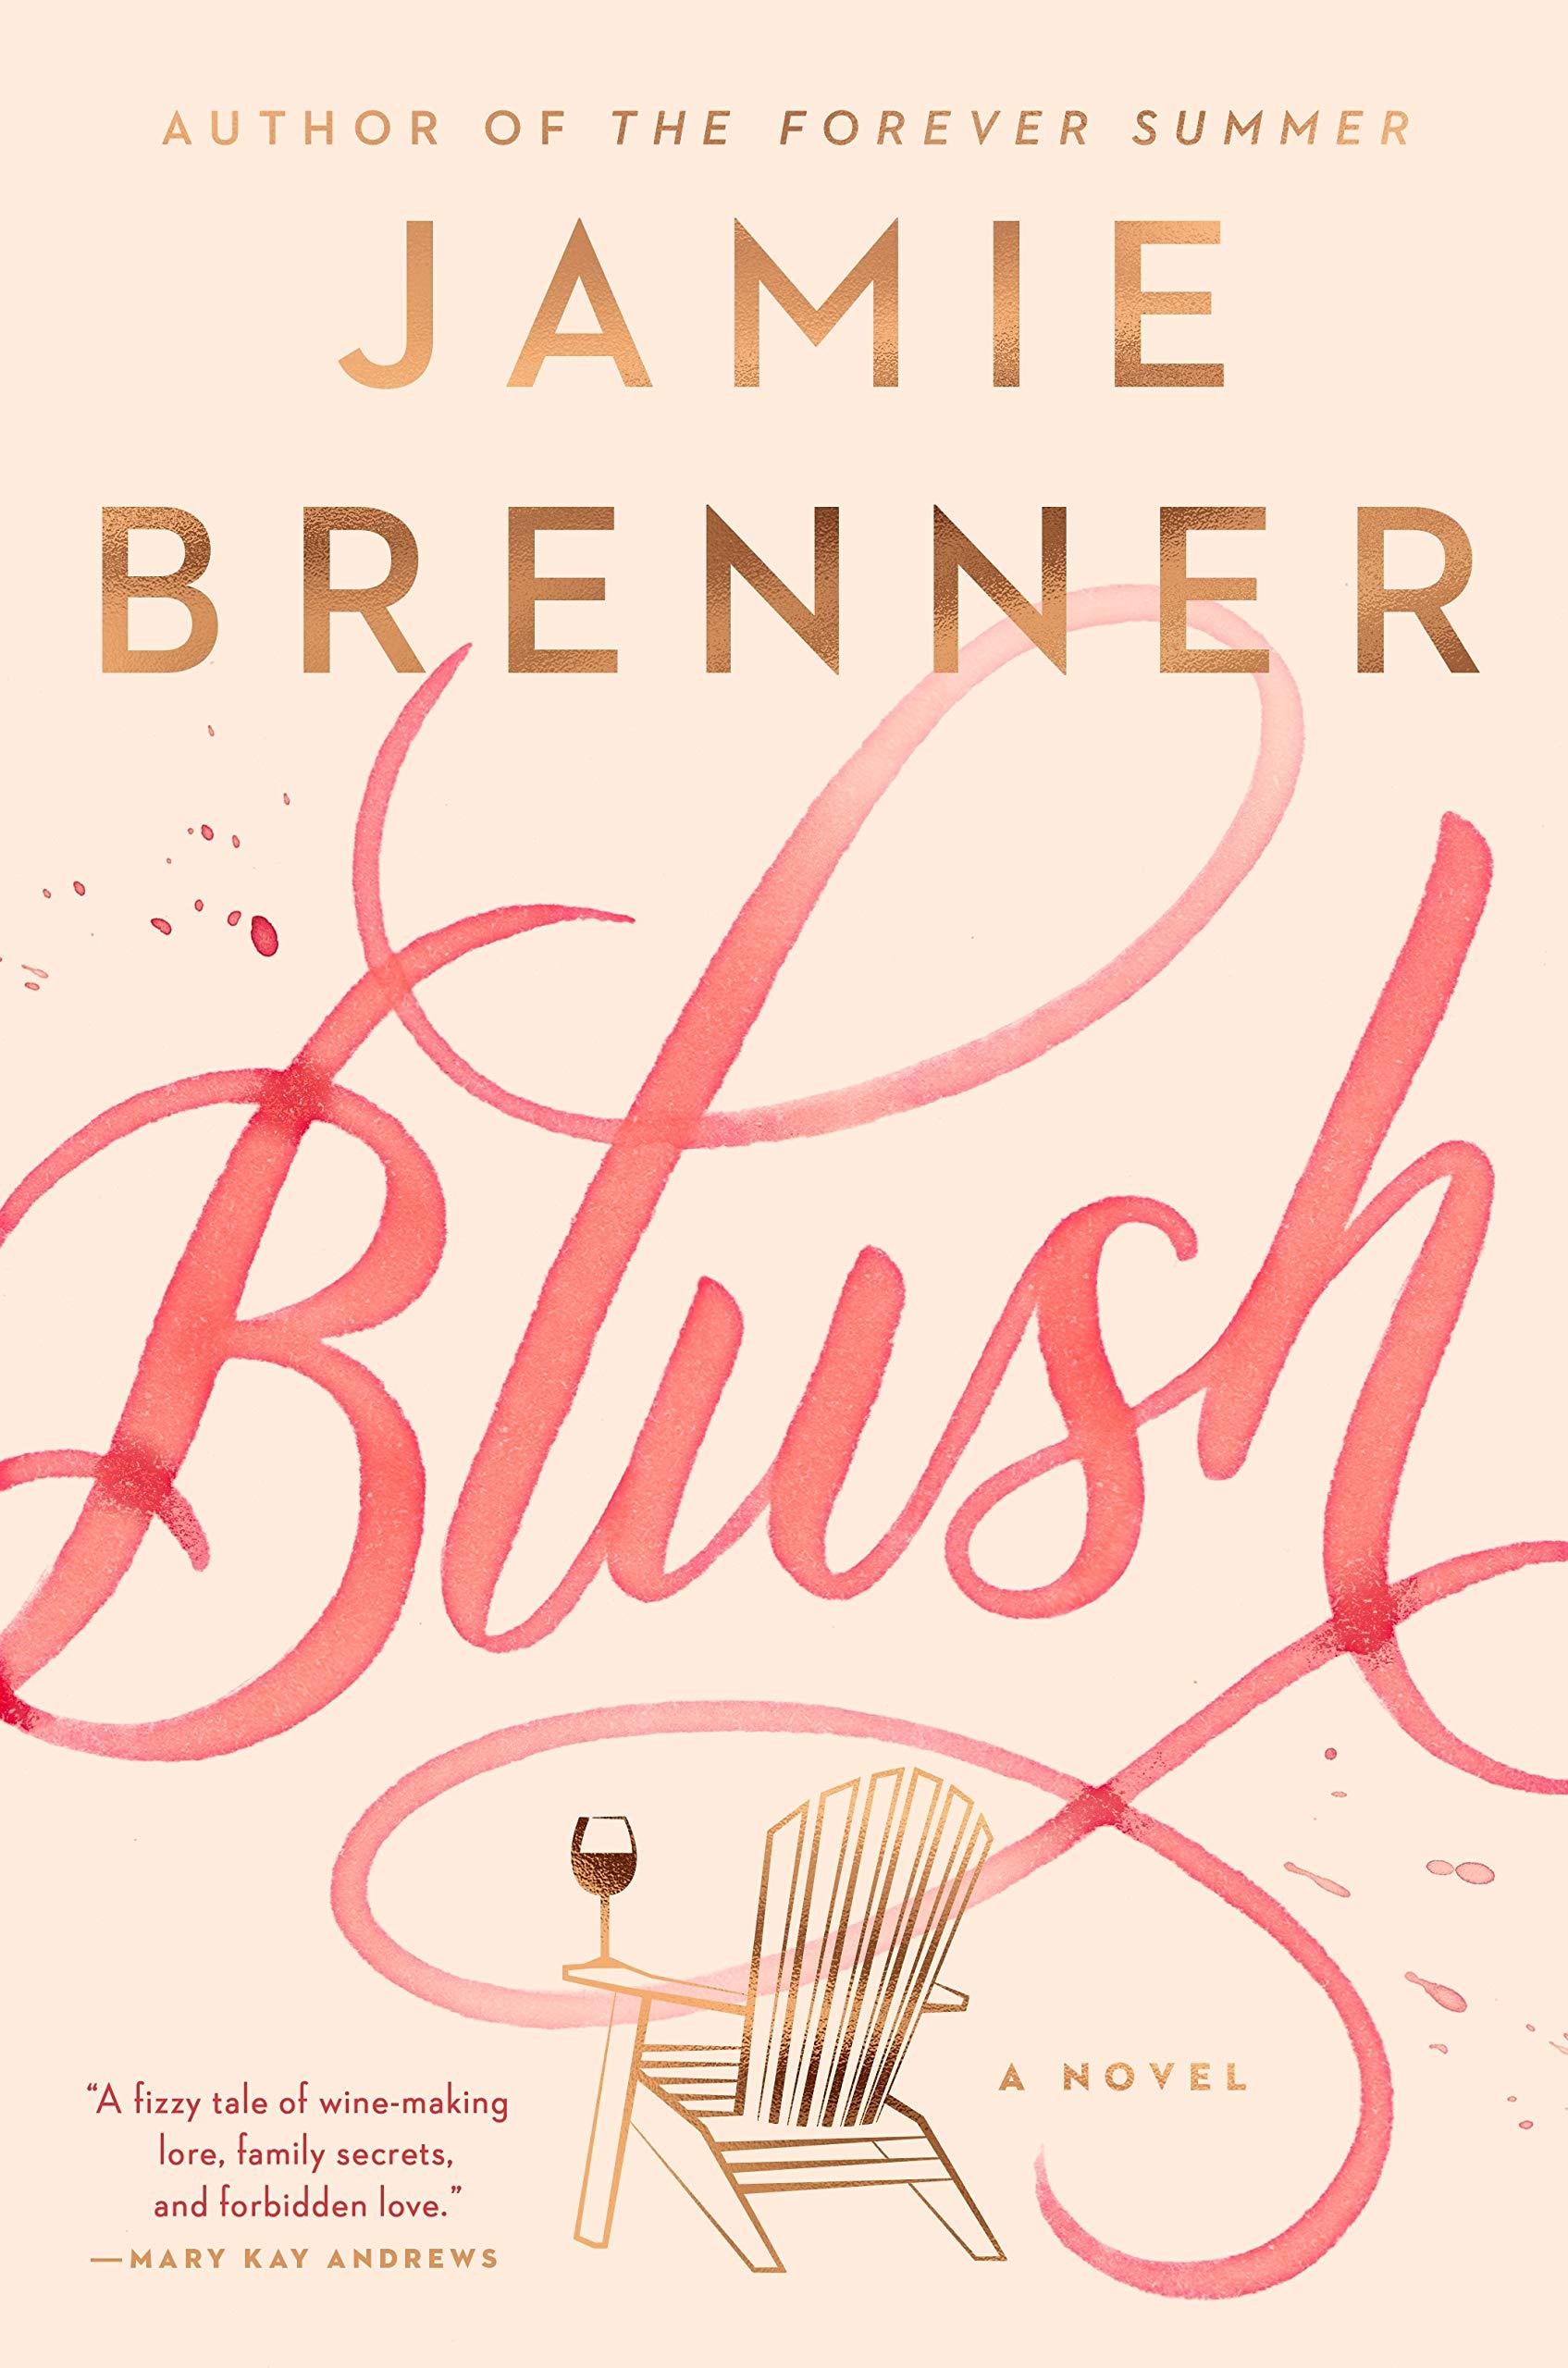 Blush: Brenner, Jamie: 9780593085752: Amazon.com: Books